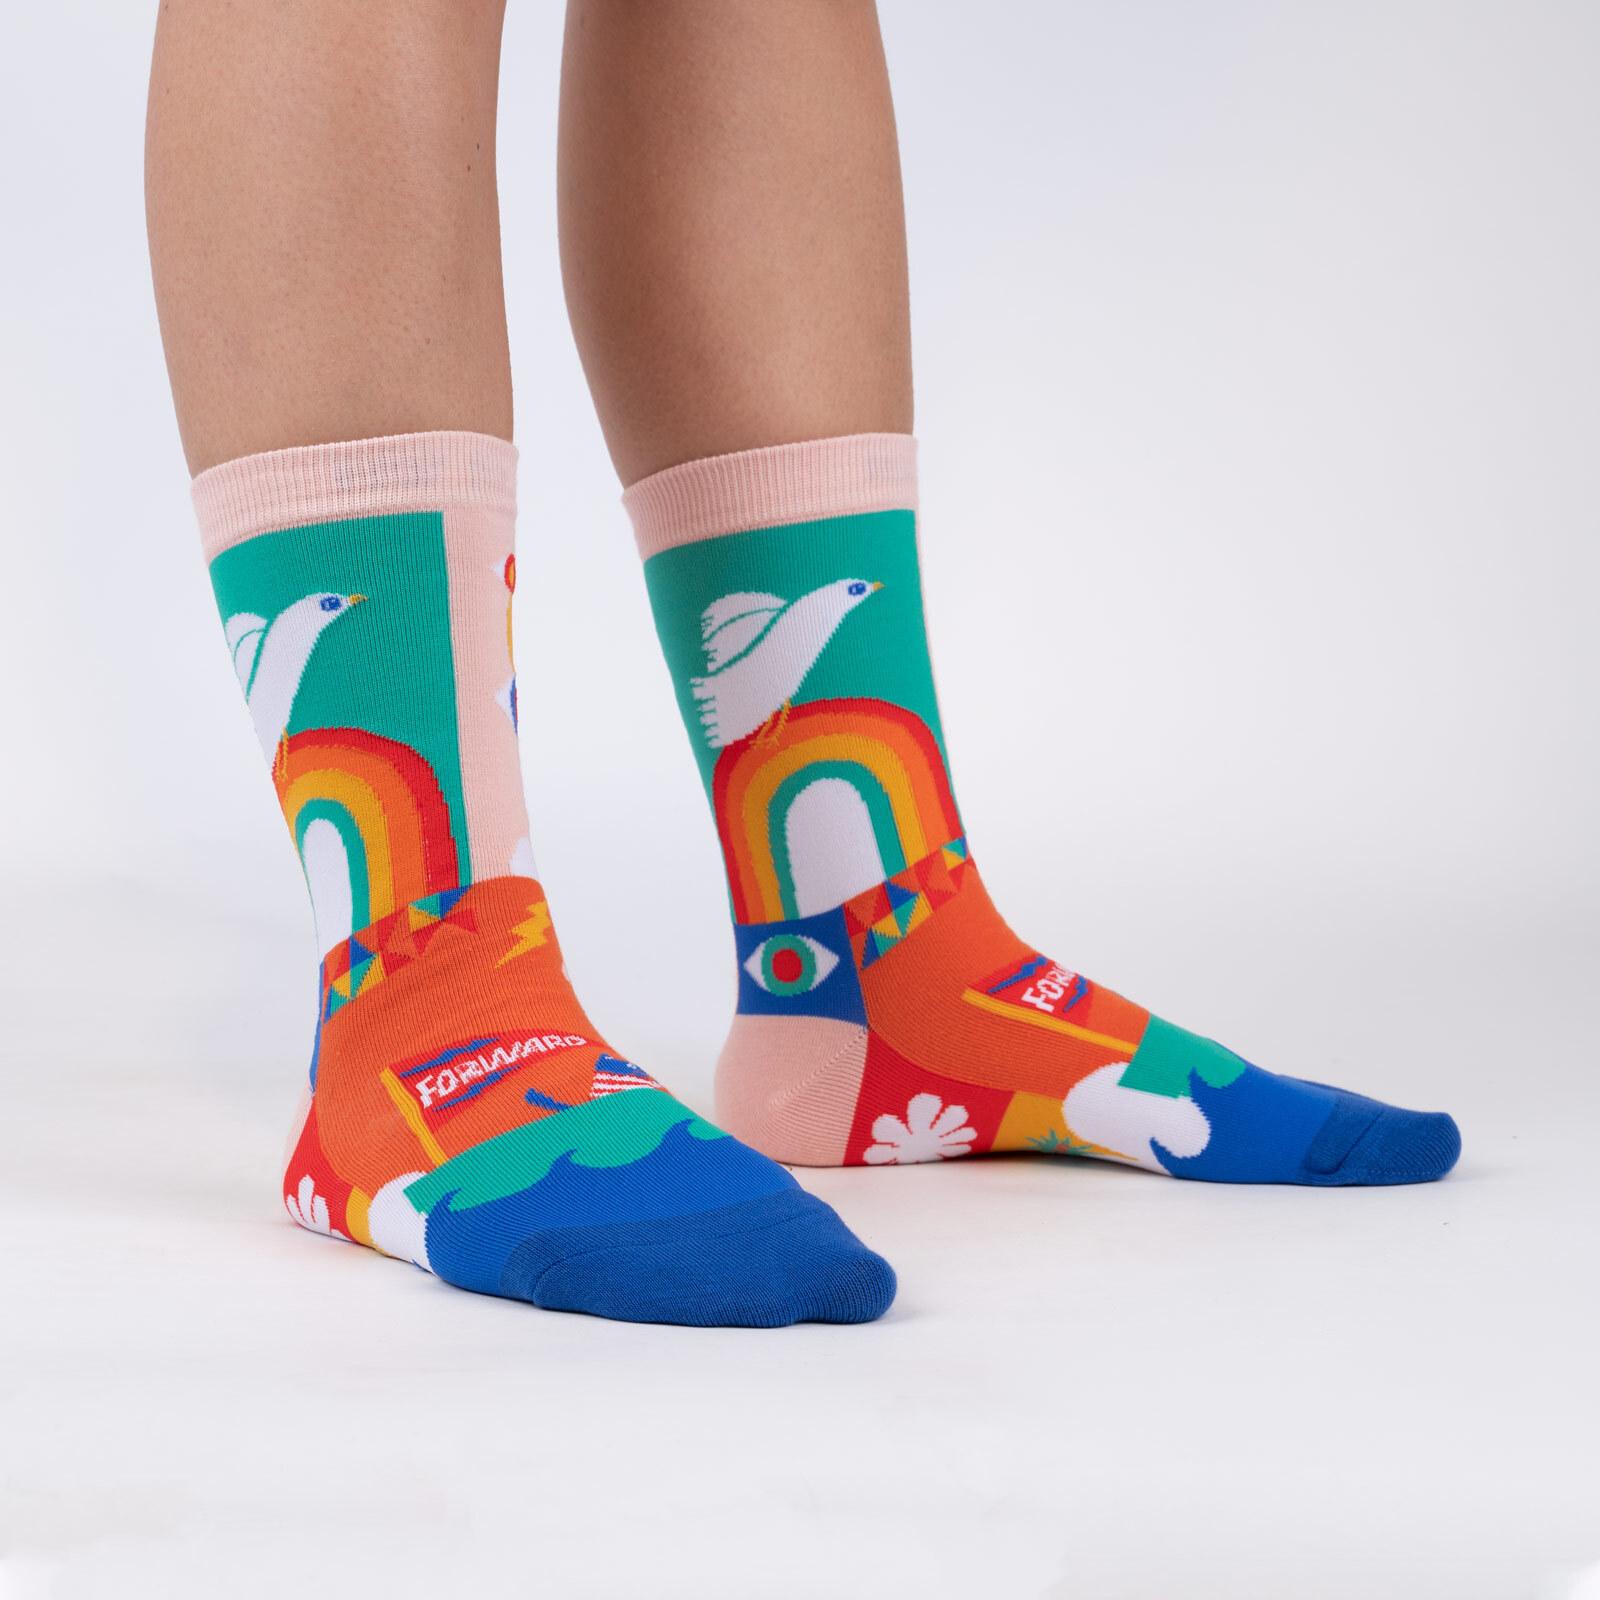 model wearing Peace and Love - Lisa Congdon Artist Crew Socks Pink - Women's